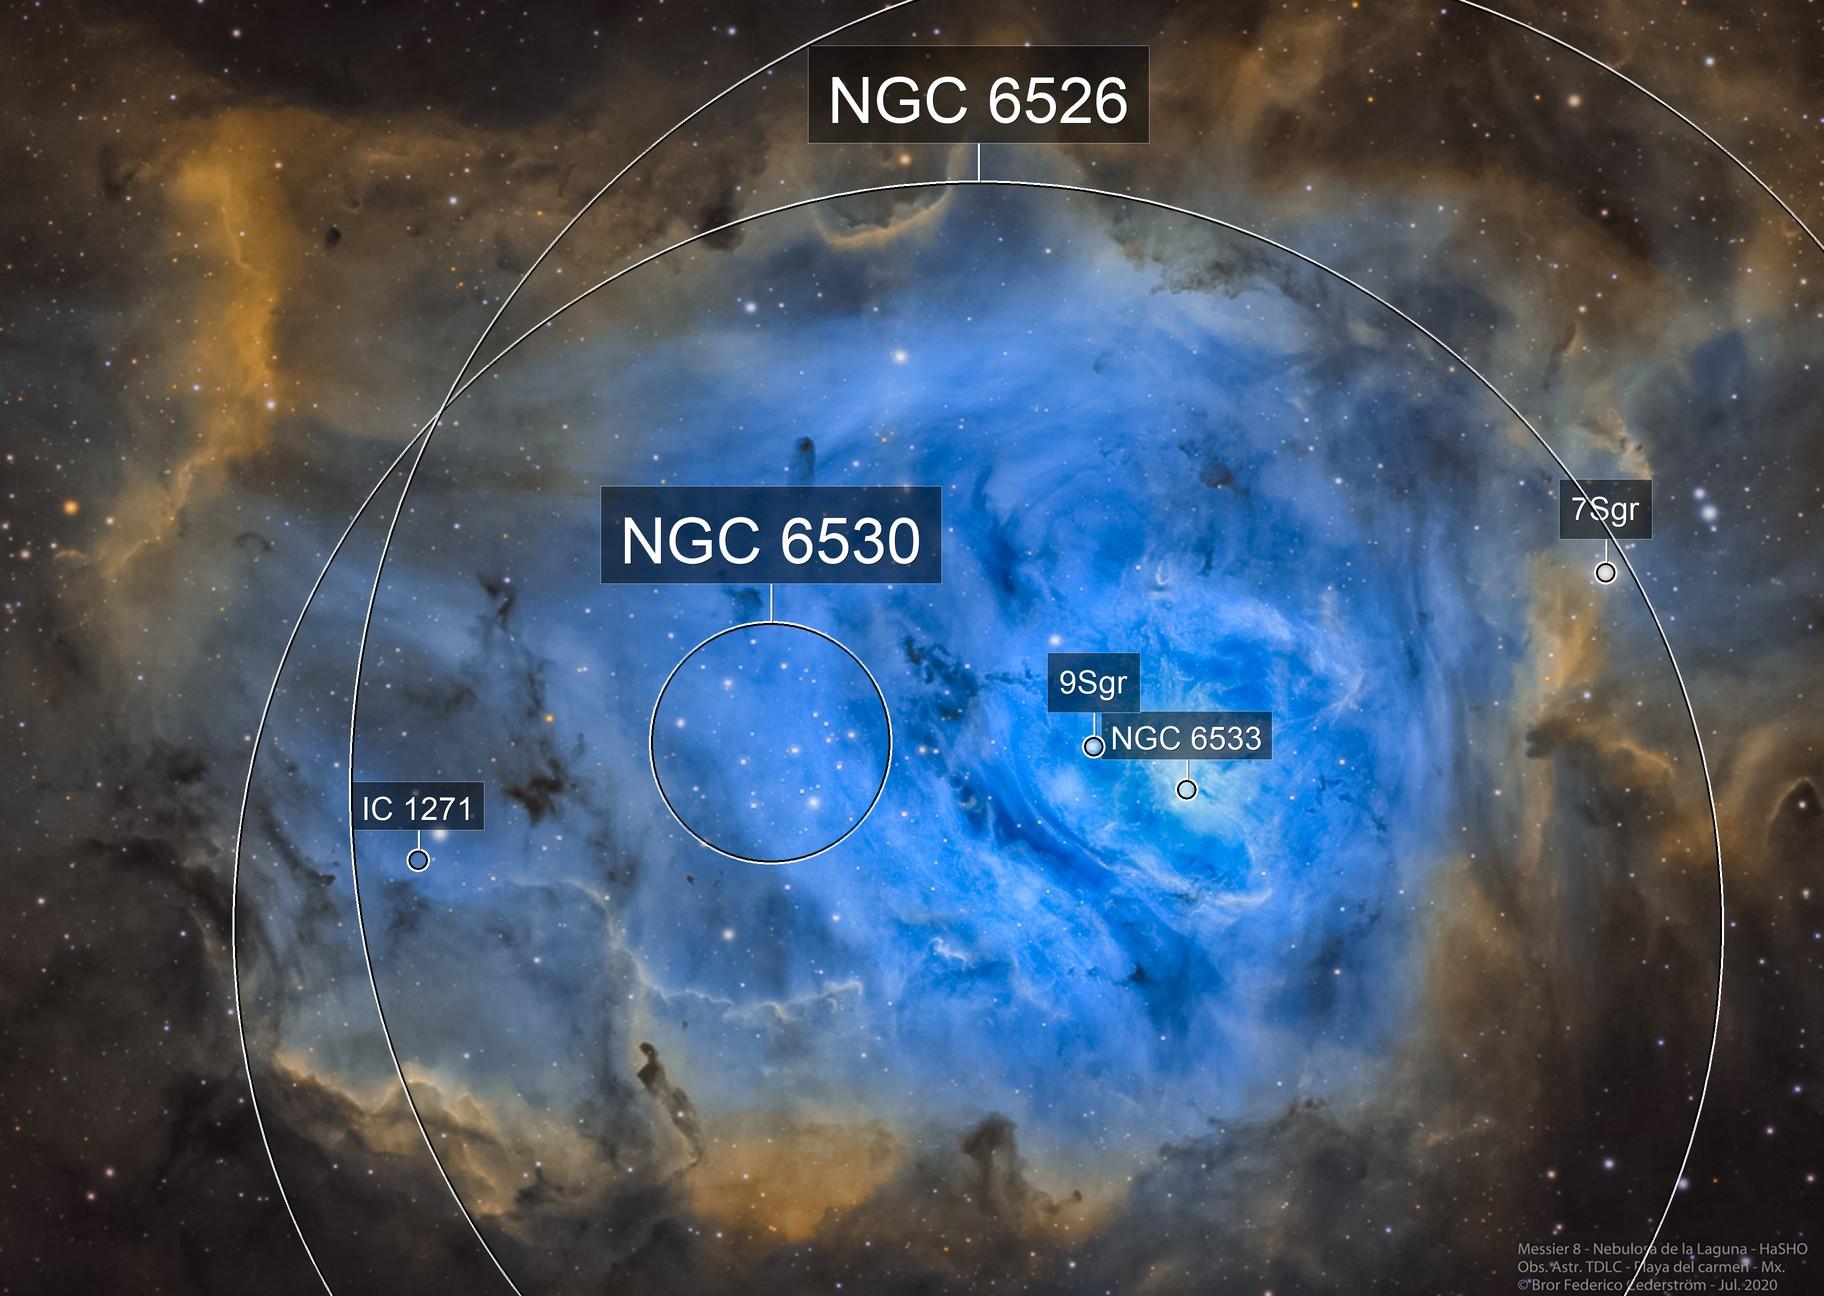 Messier 8 - Nebulosa de la Laguna